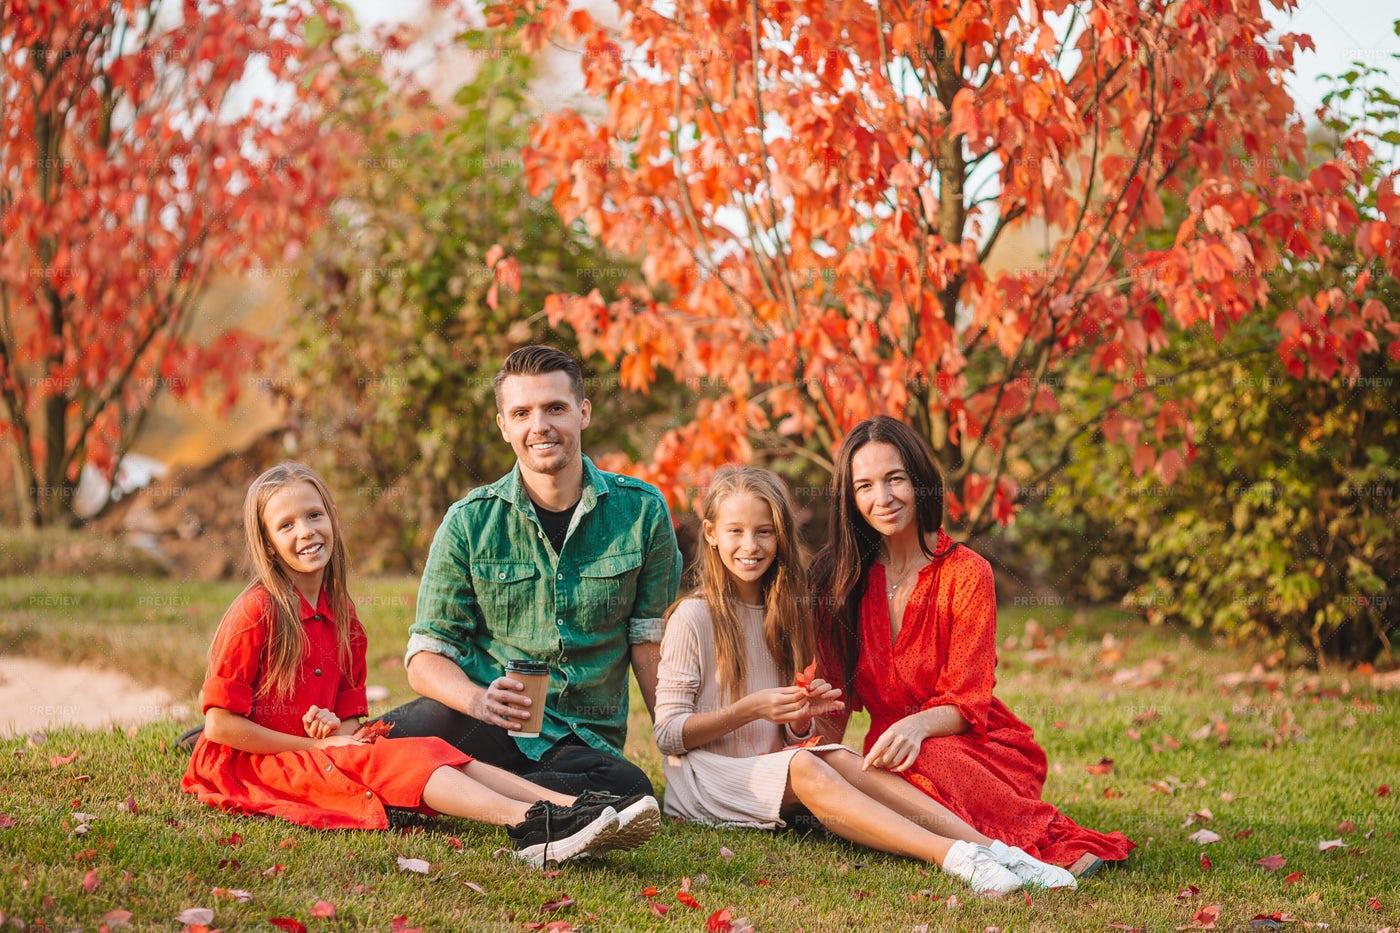 Happy Family In Autumn Park: Stock Photos